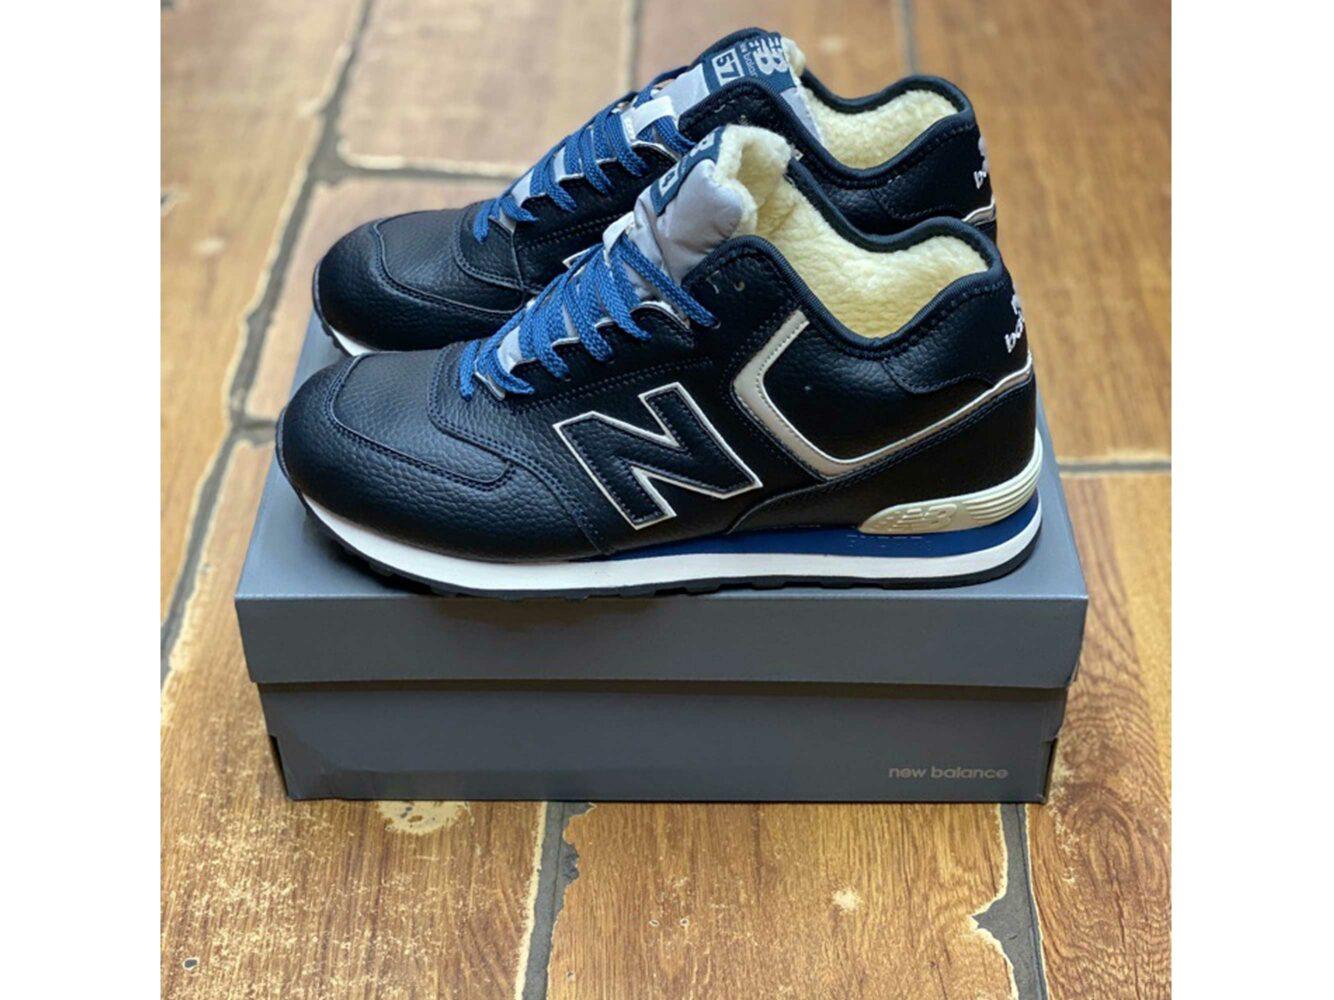 new balance 574 dark blue winter купить